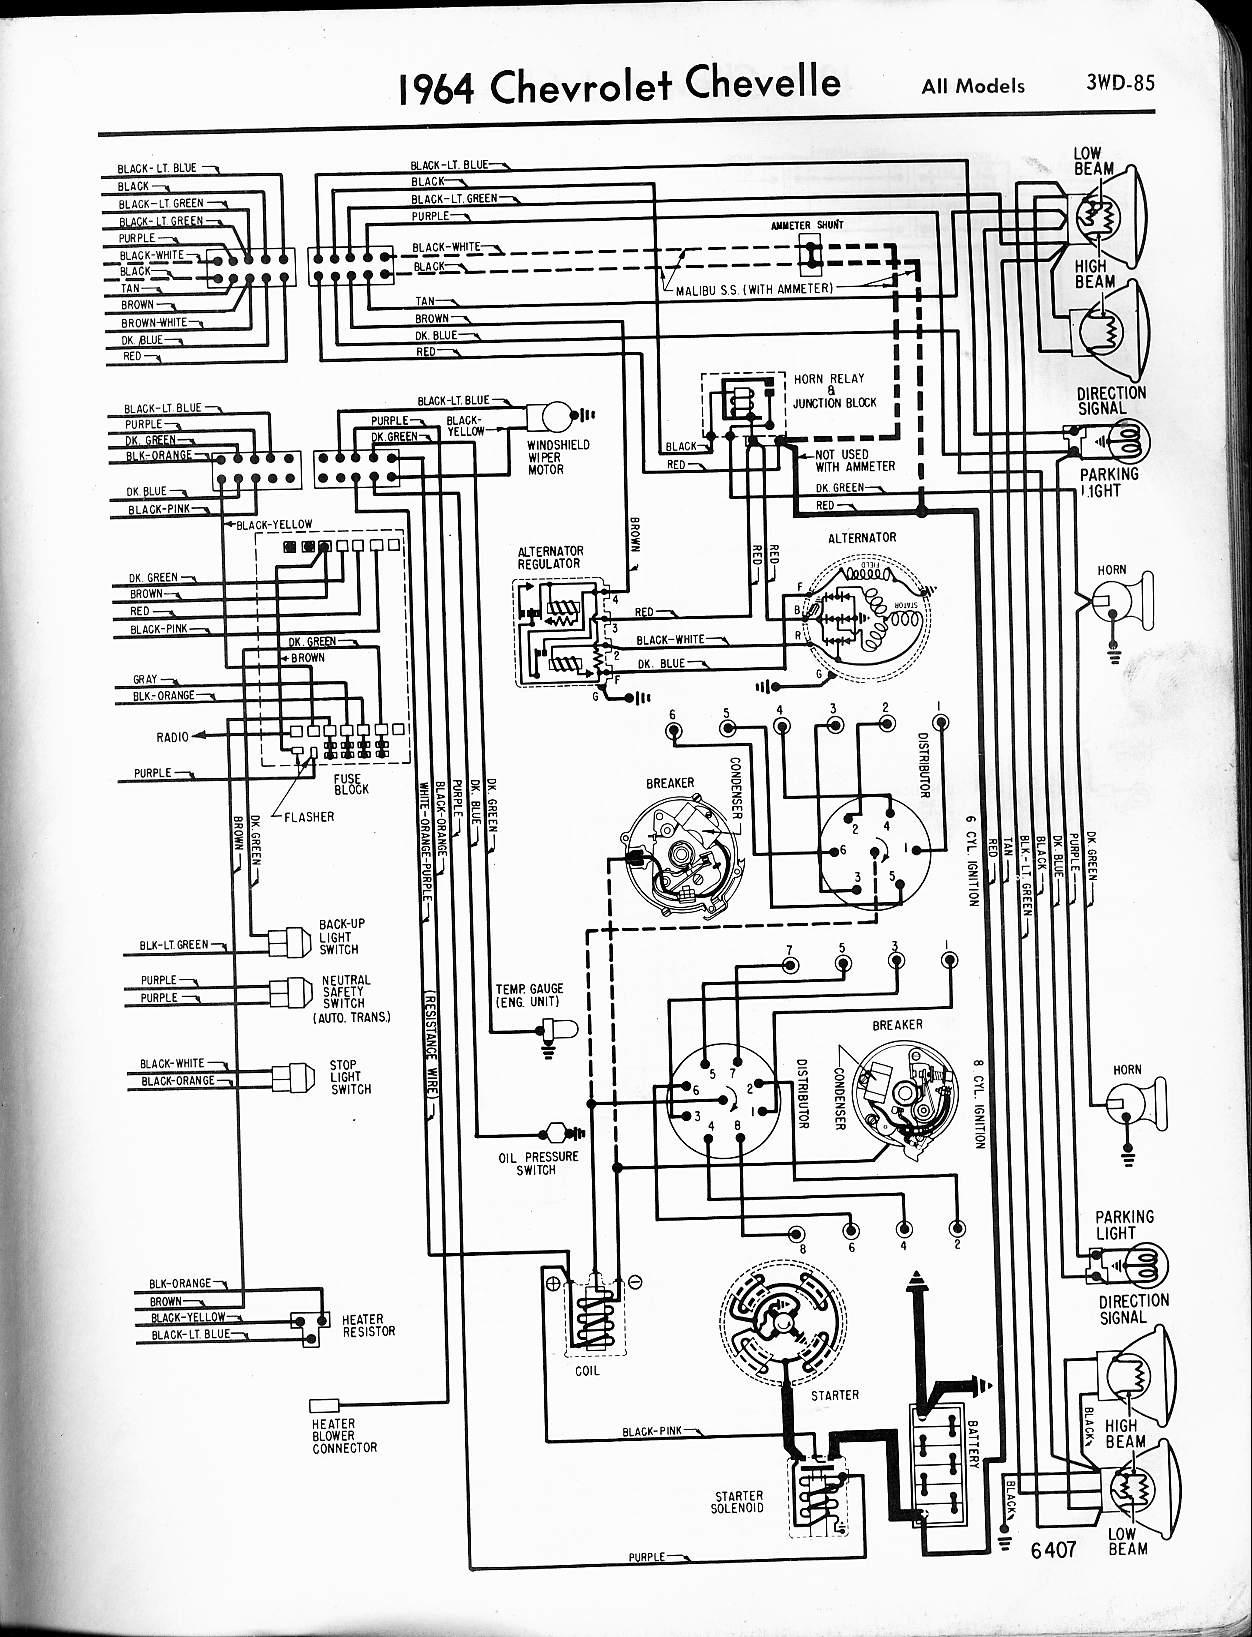 gm fuse box diagram 1964 impala